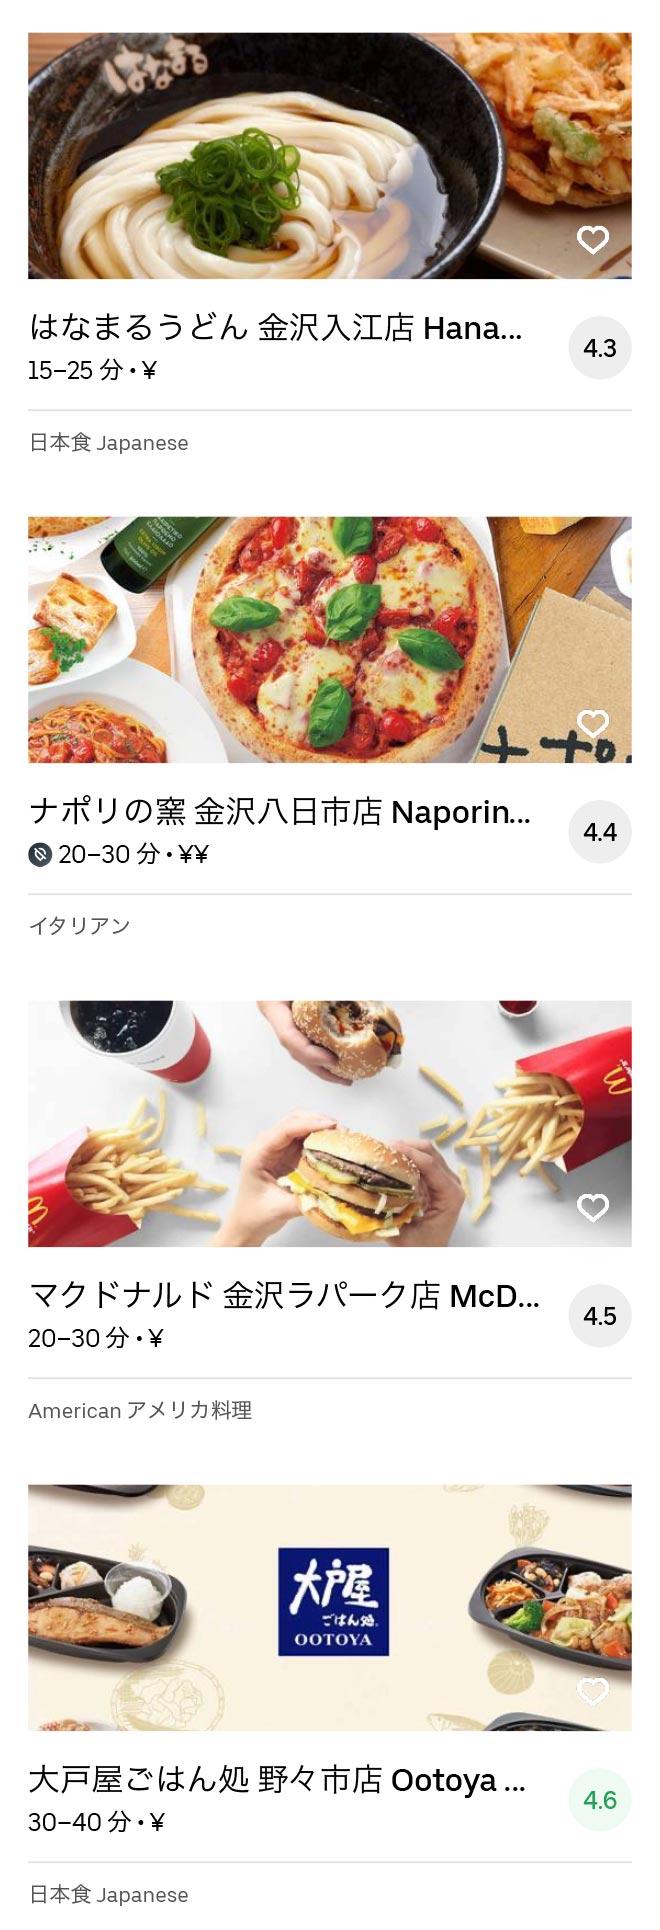 Nishi kanazawa menu 2005 05